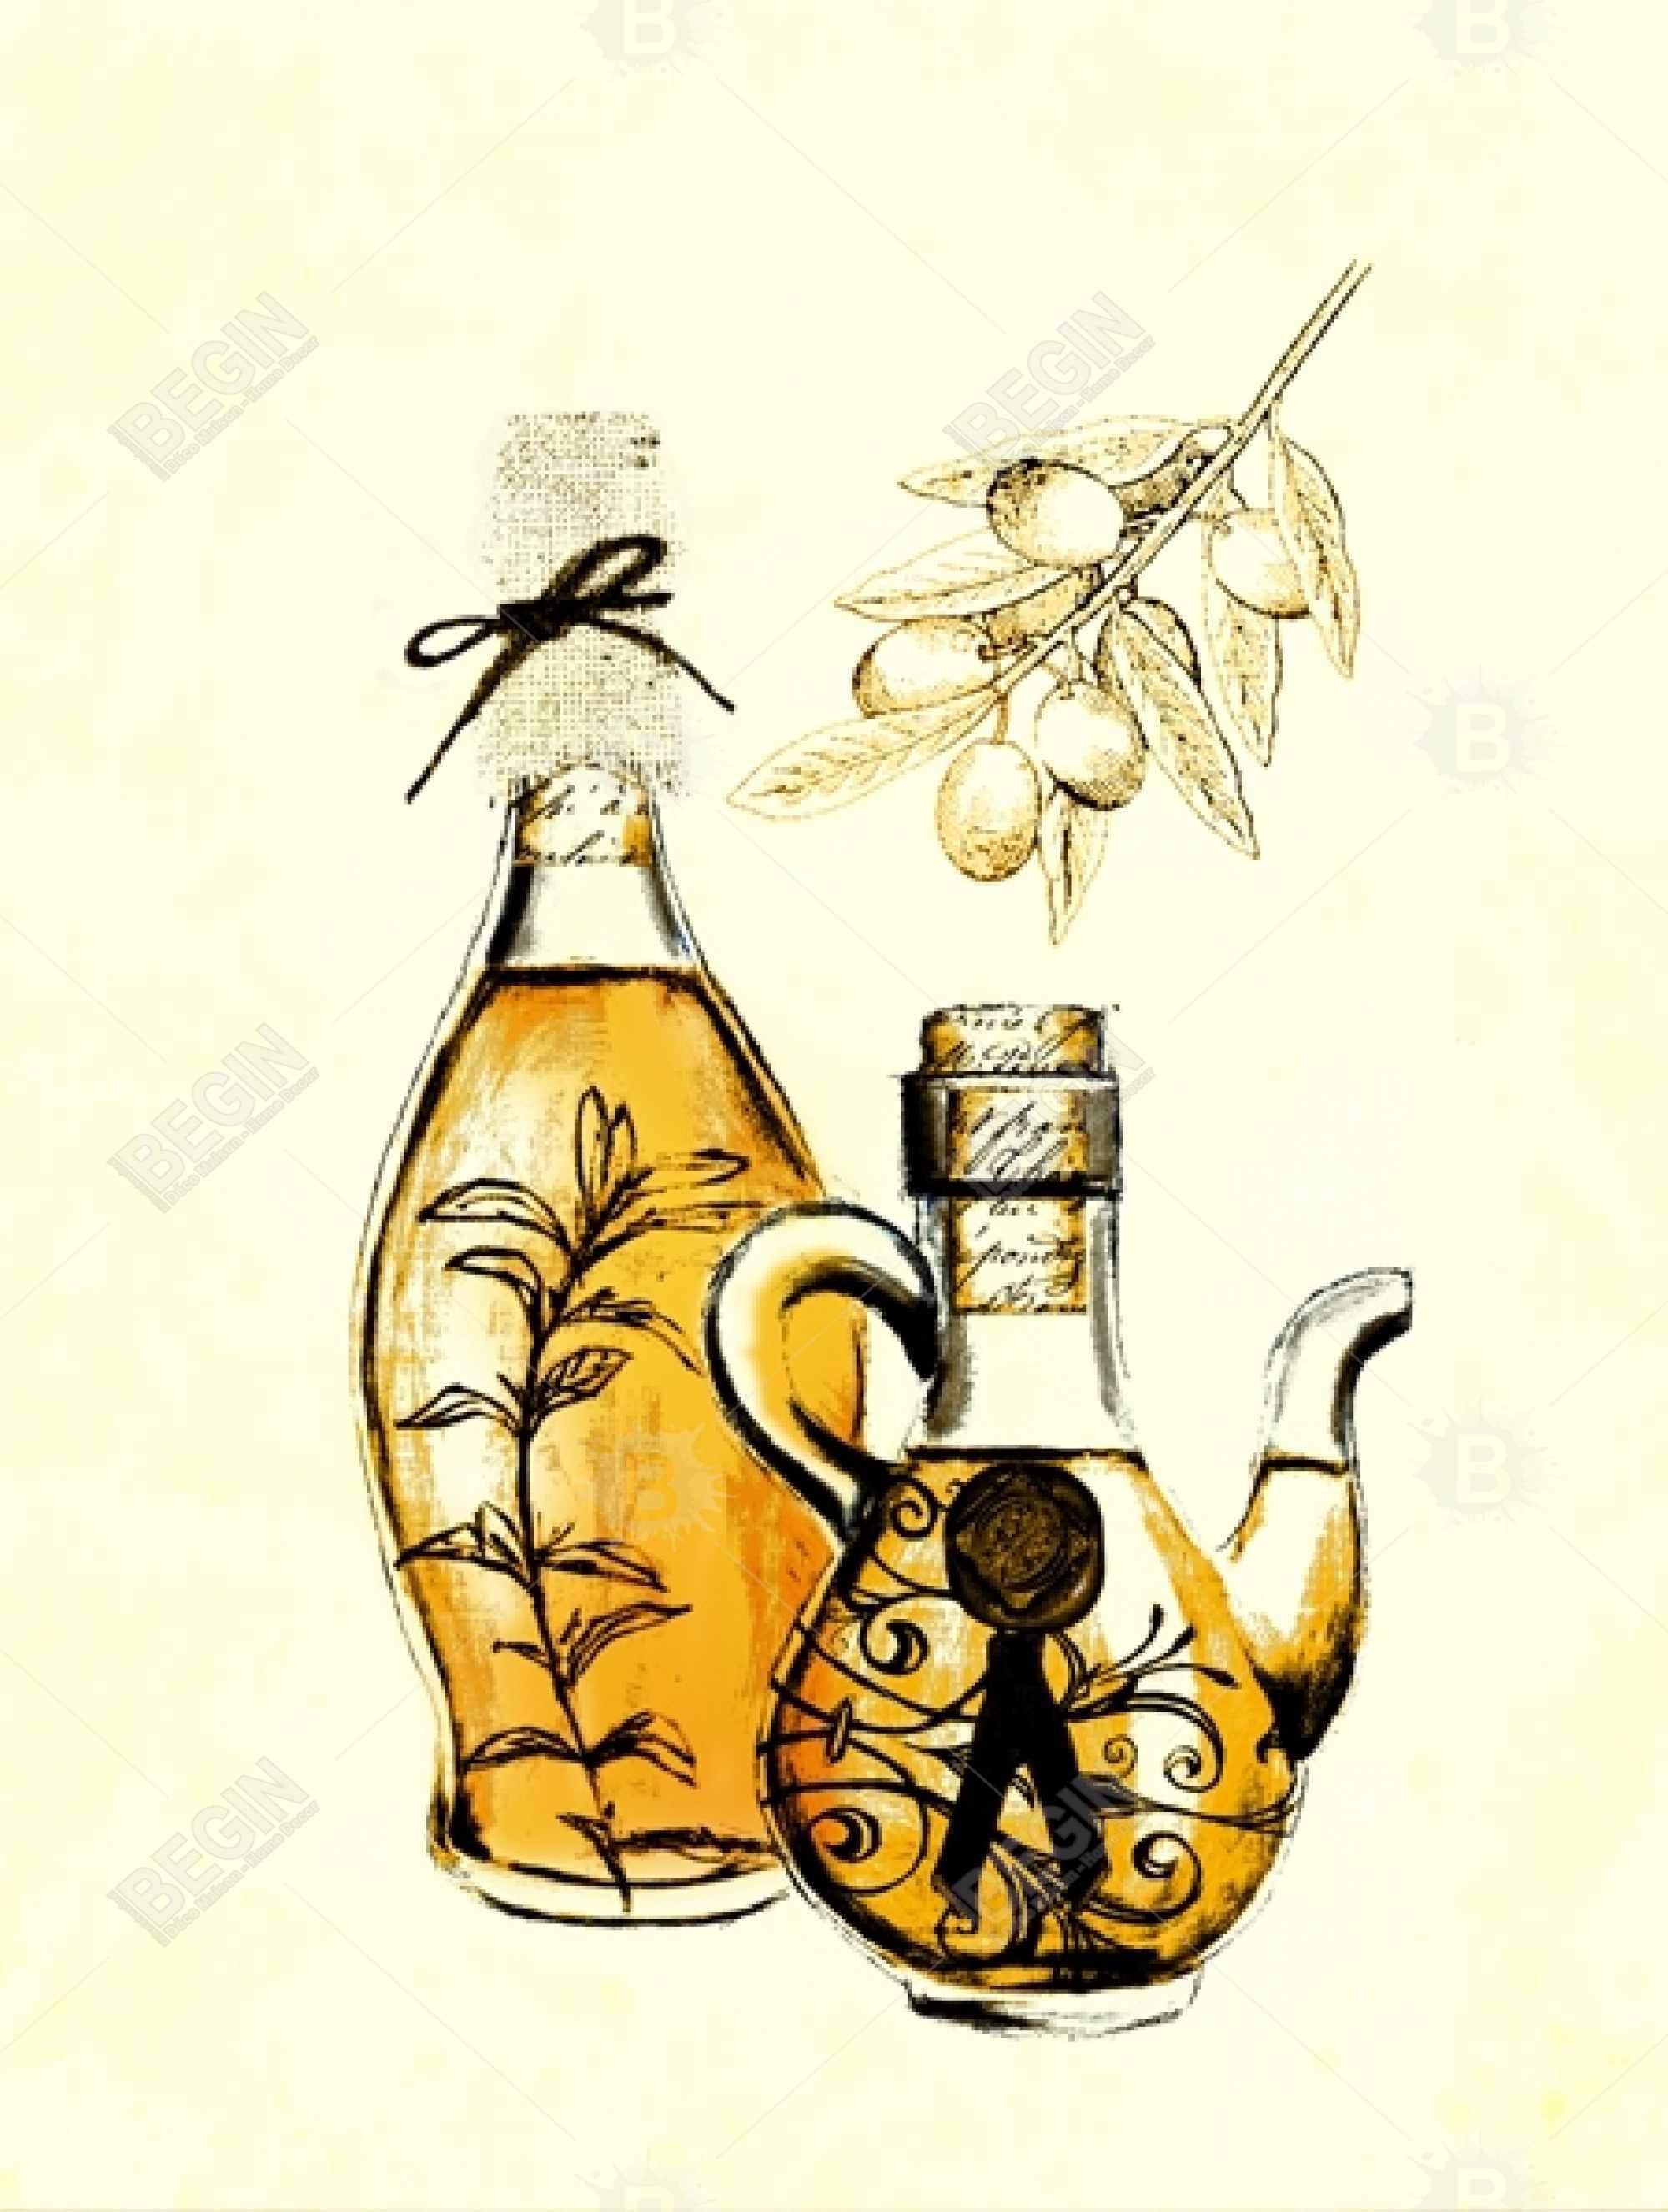 Two bottles of olive oil